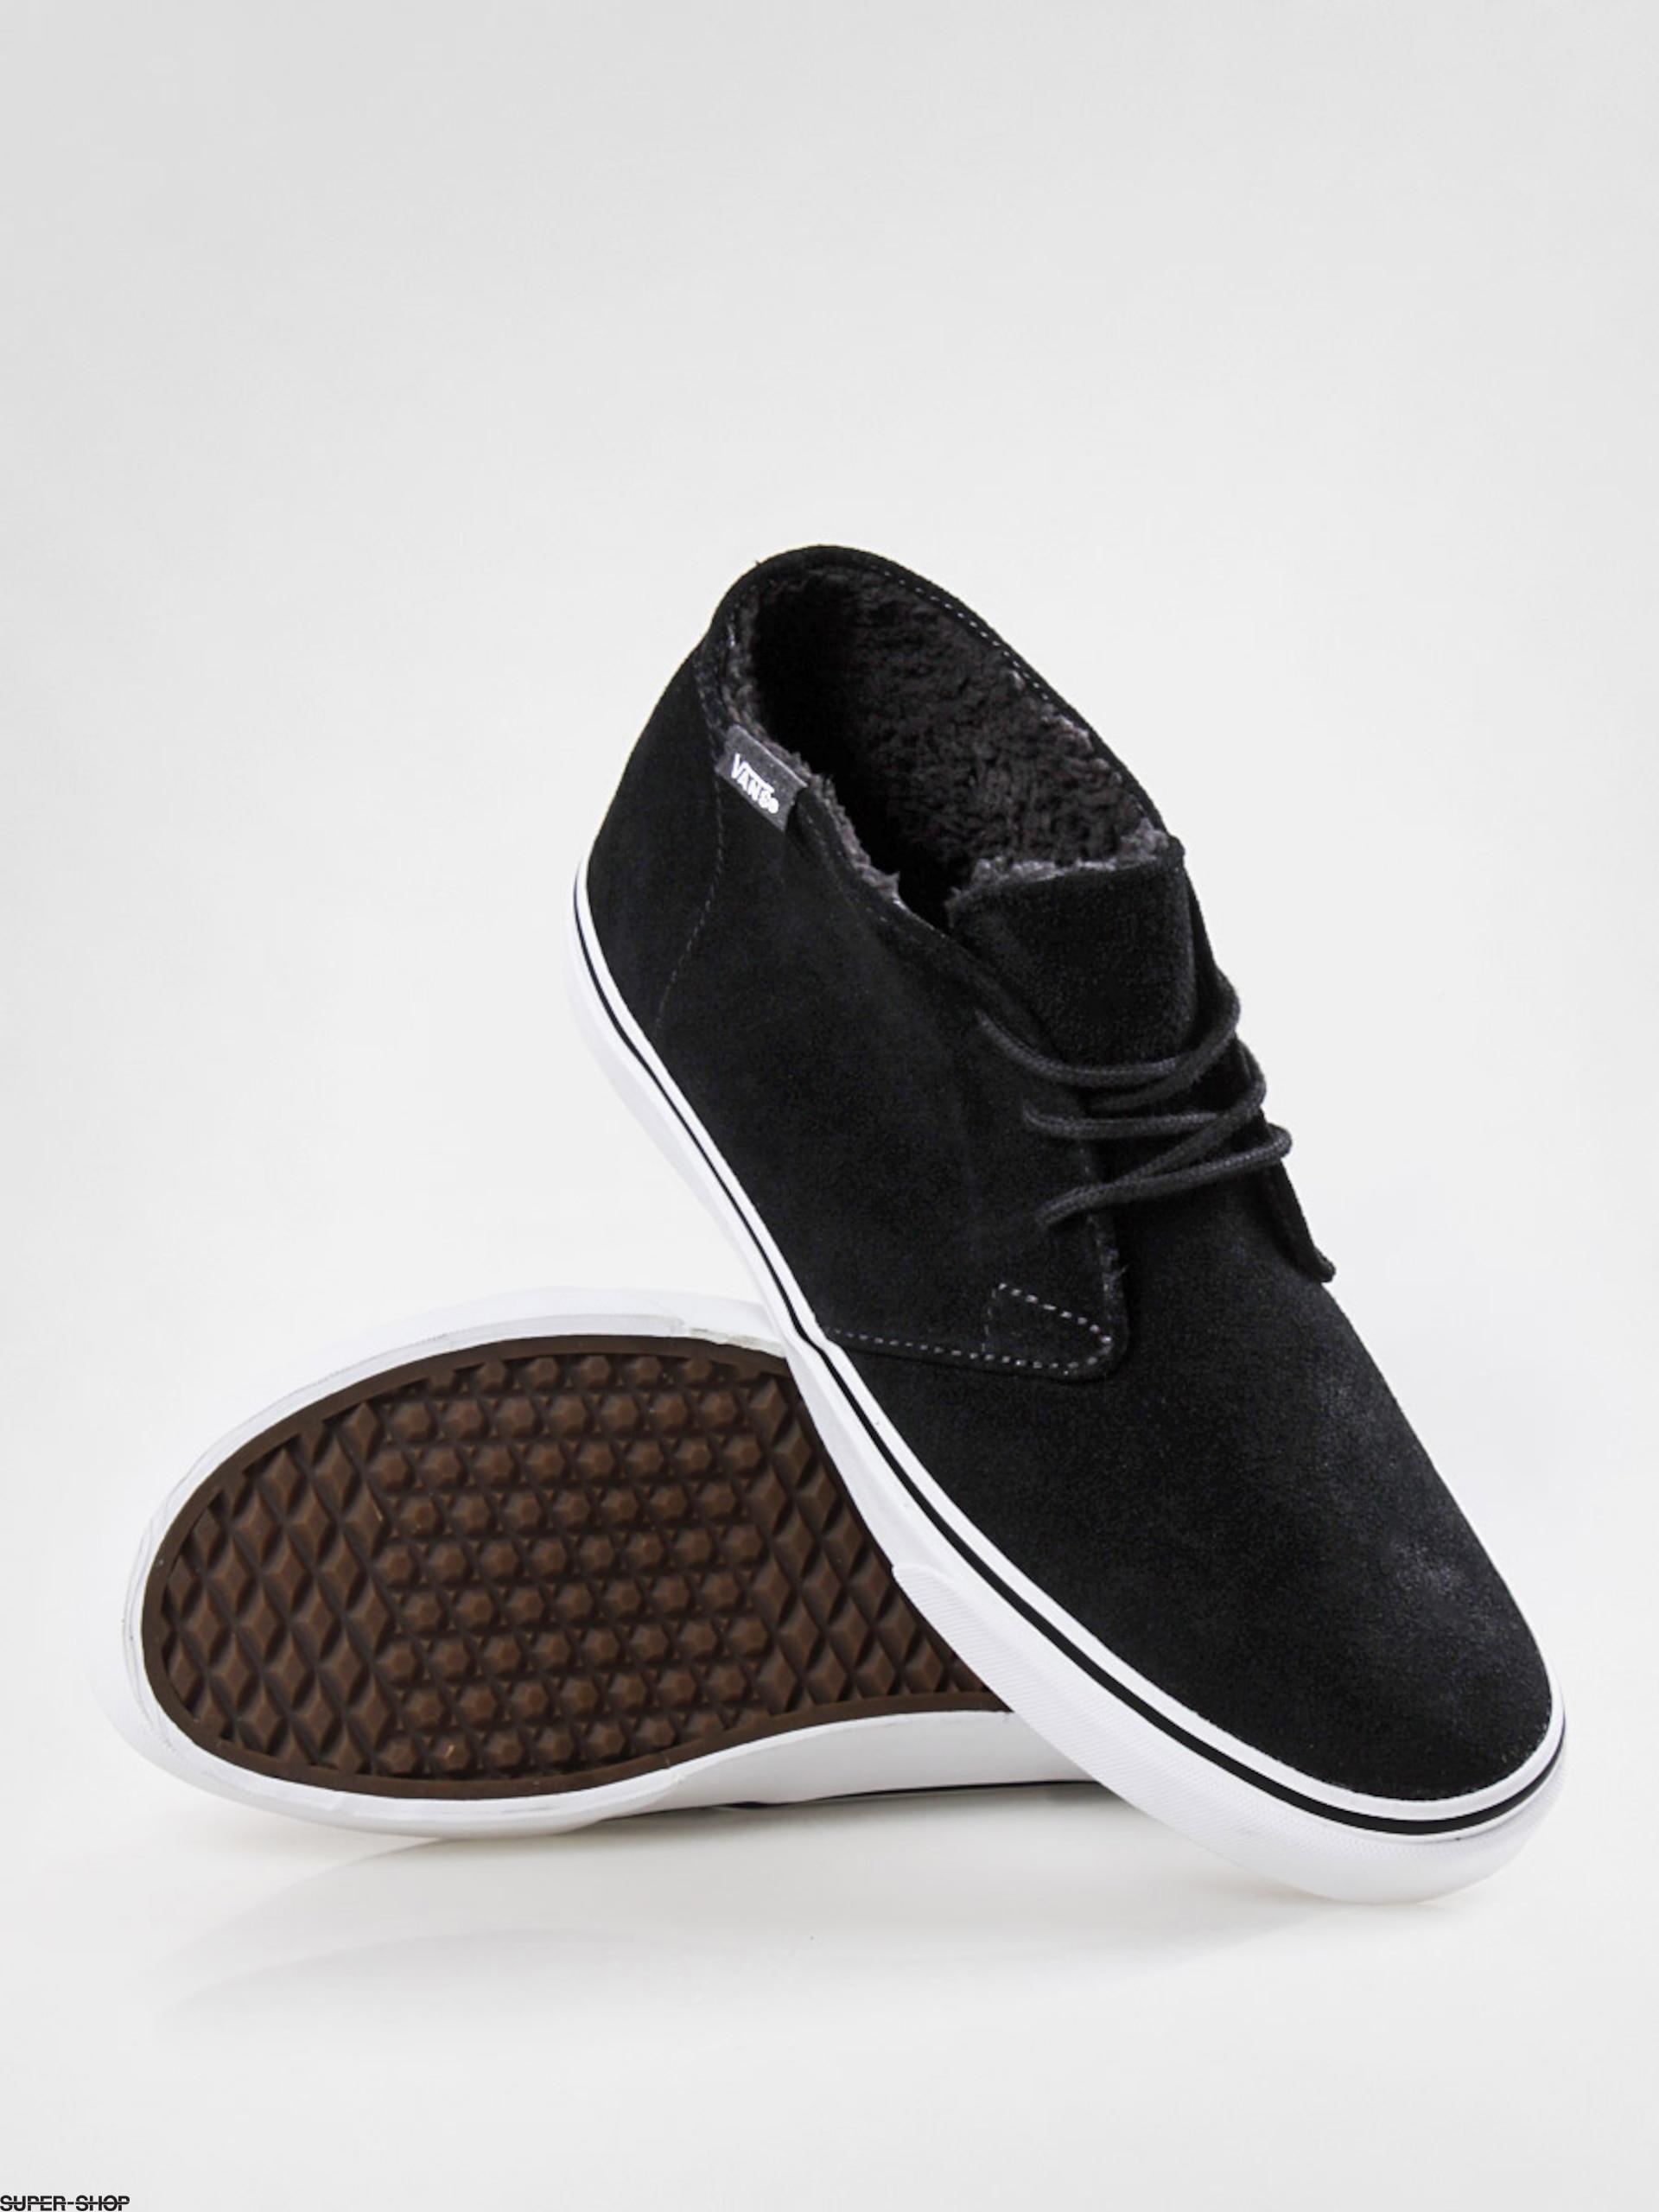 25ec9d6762 Vans shoes Chukka Decon (fleece lining black)